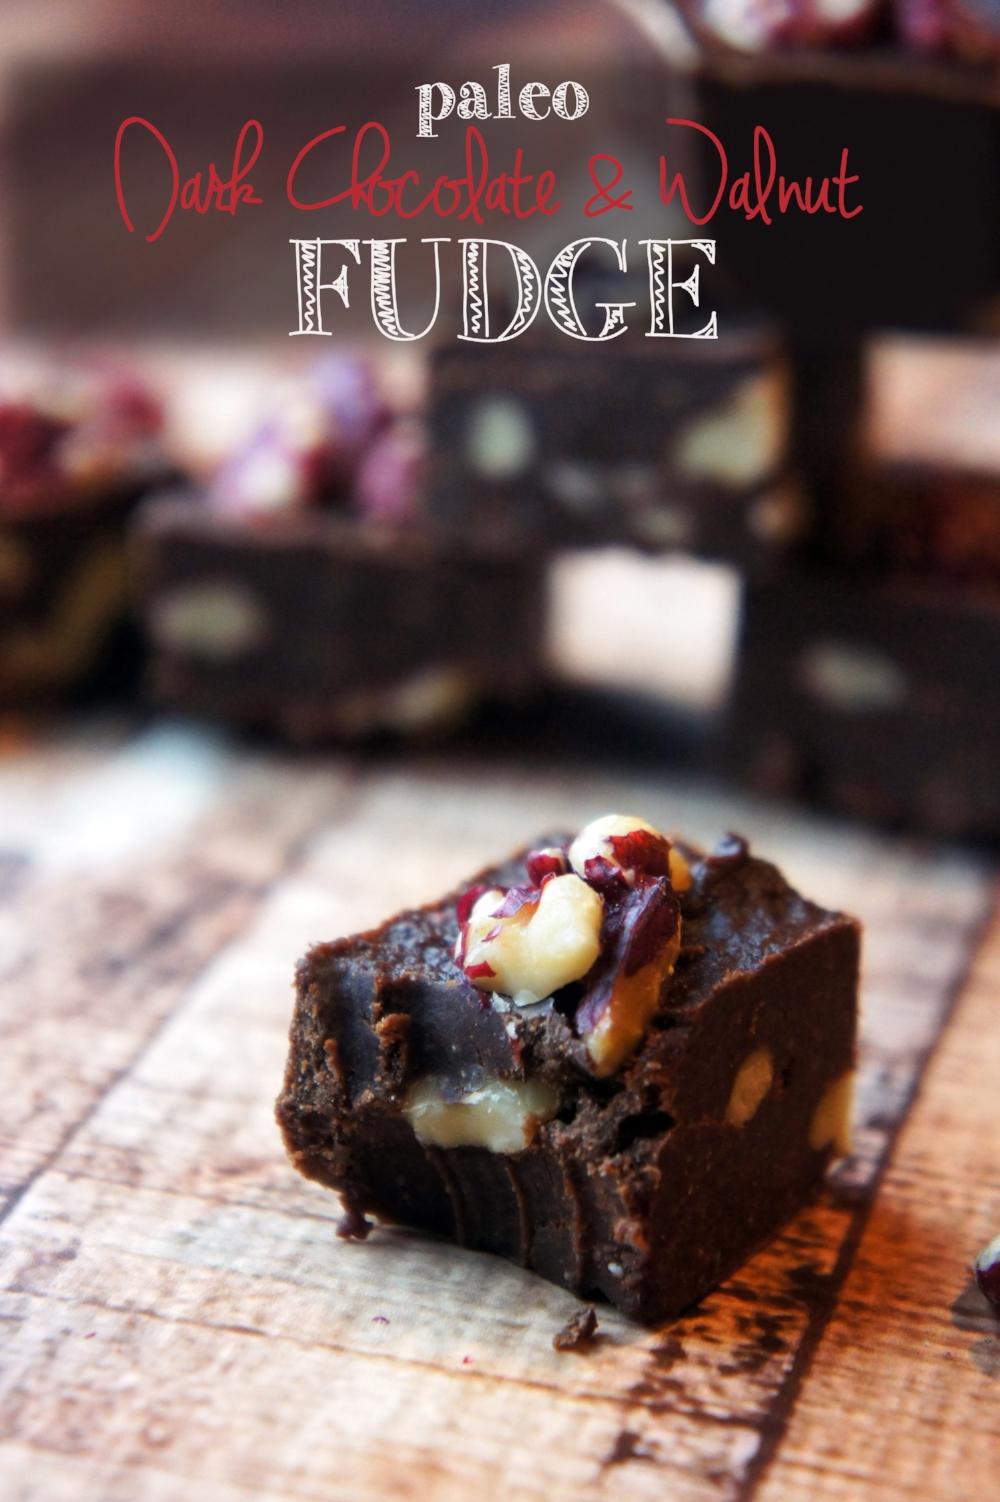 Dark Chocolate and Walnut Paleo Fudge